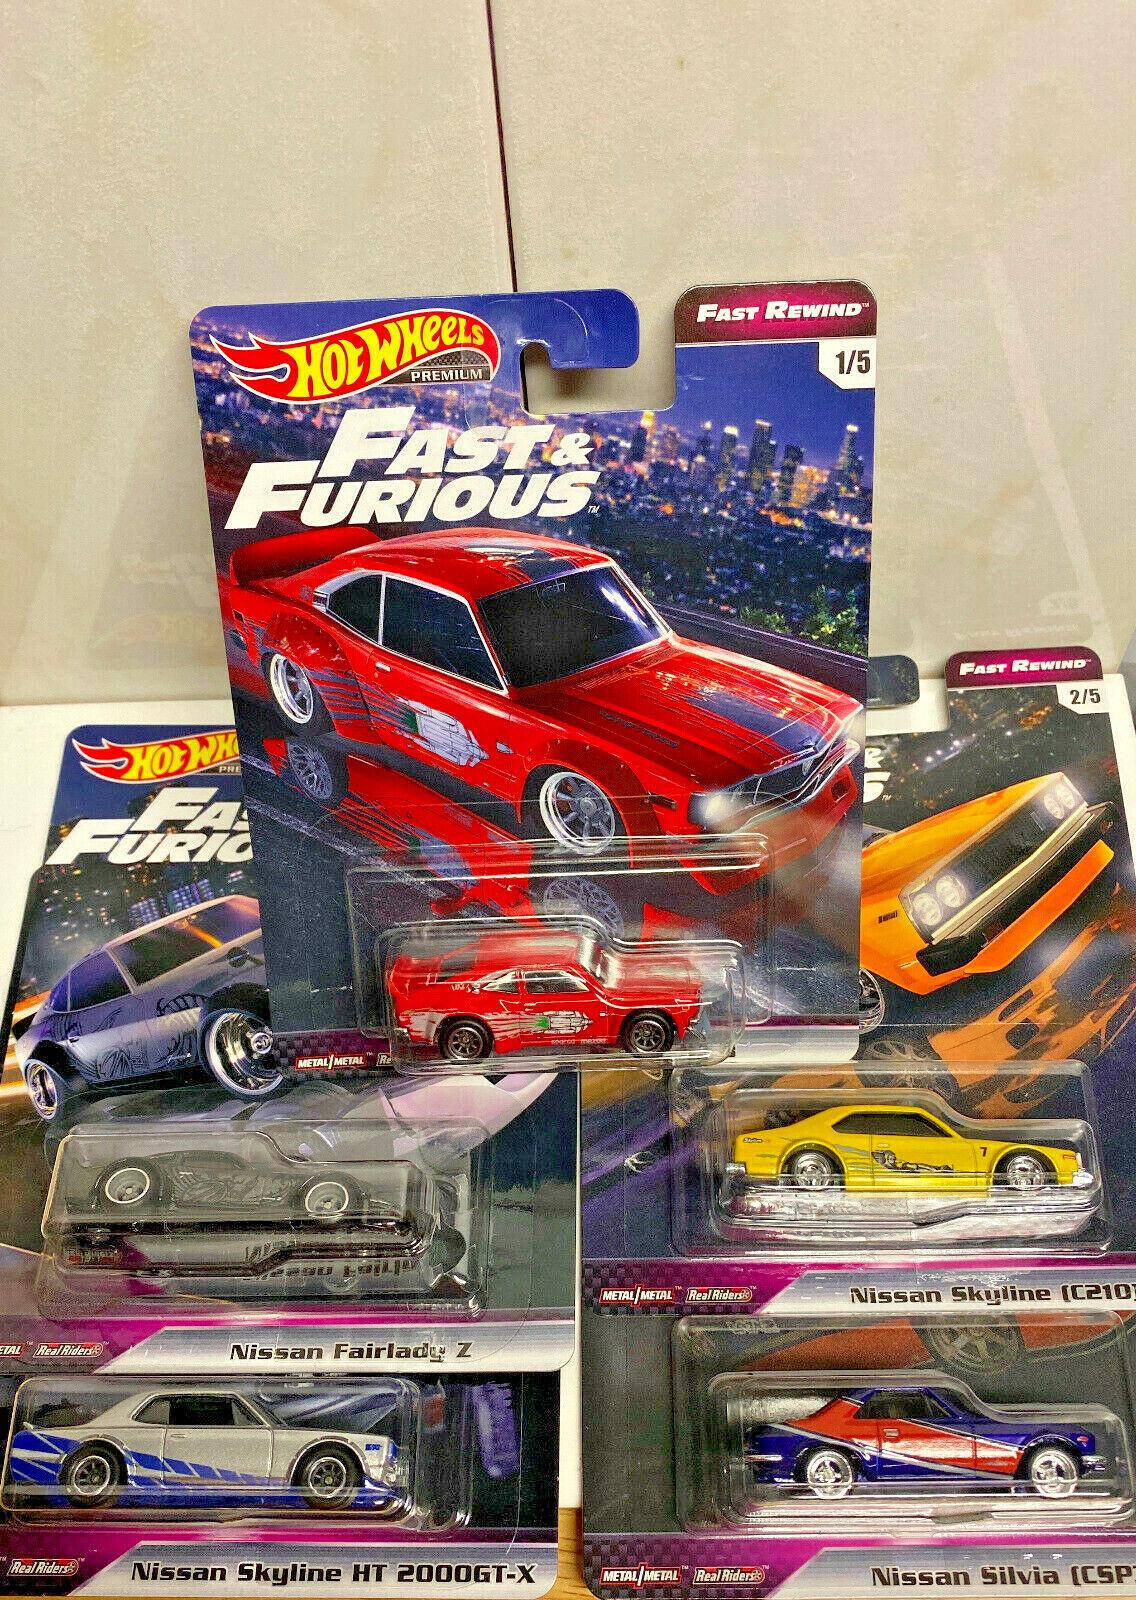 2019 Hot Wheels Fast And Furious Fast Rewind FULL SET OF 5 NIP